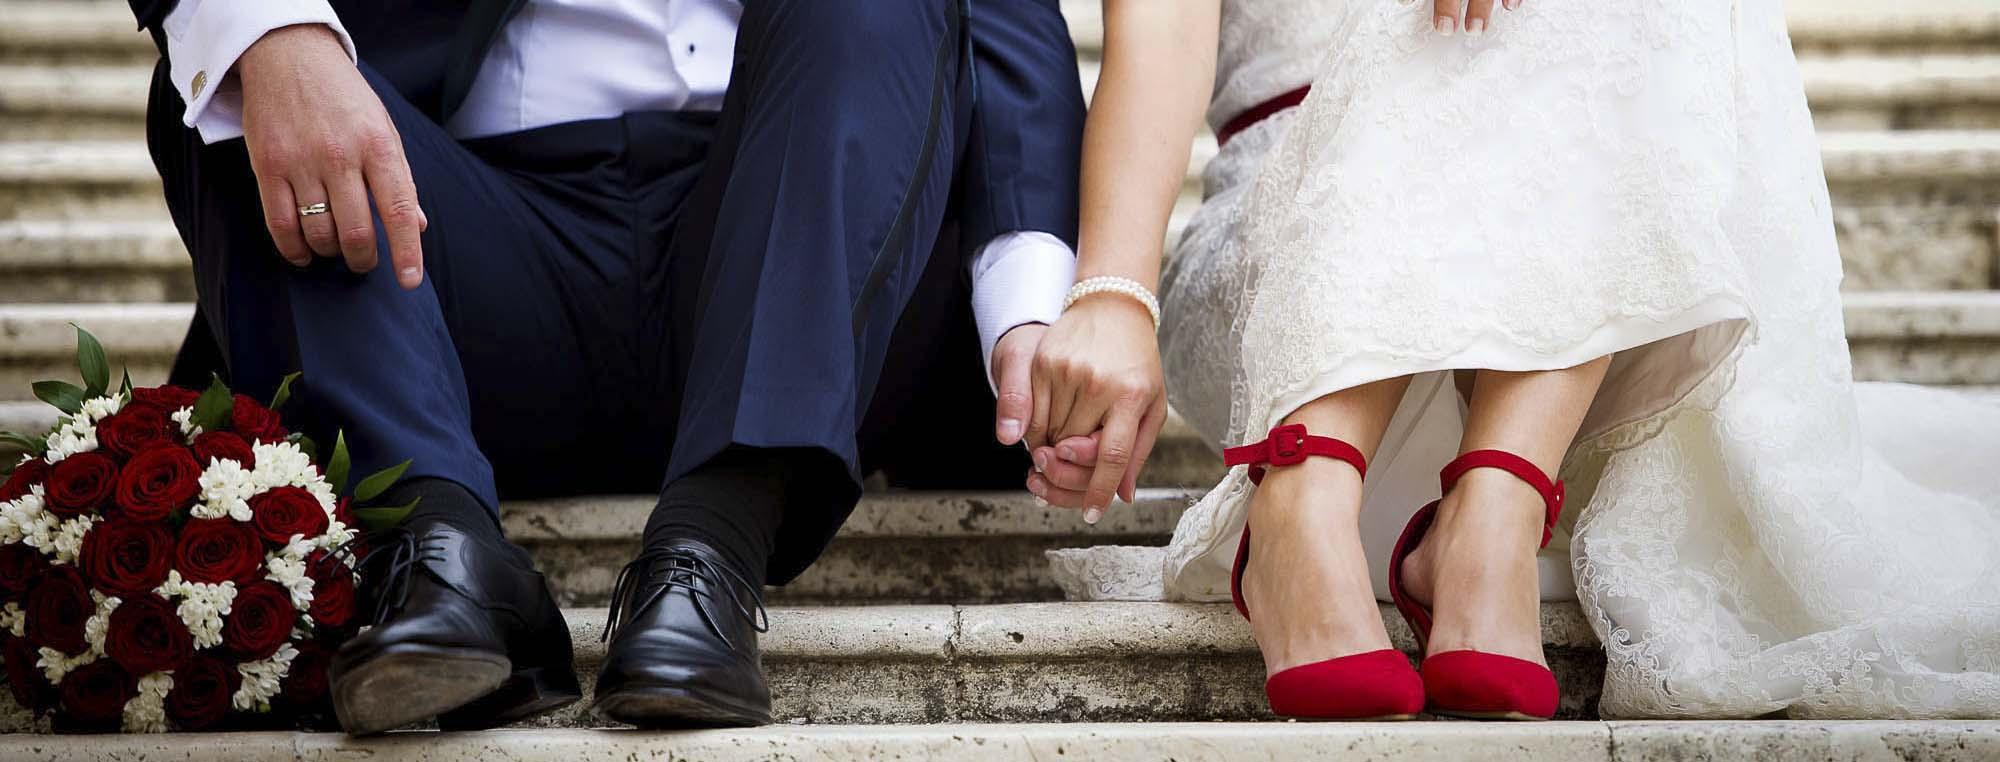 fotografo-matrimonio-video-matrimonio Novara